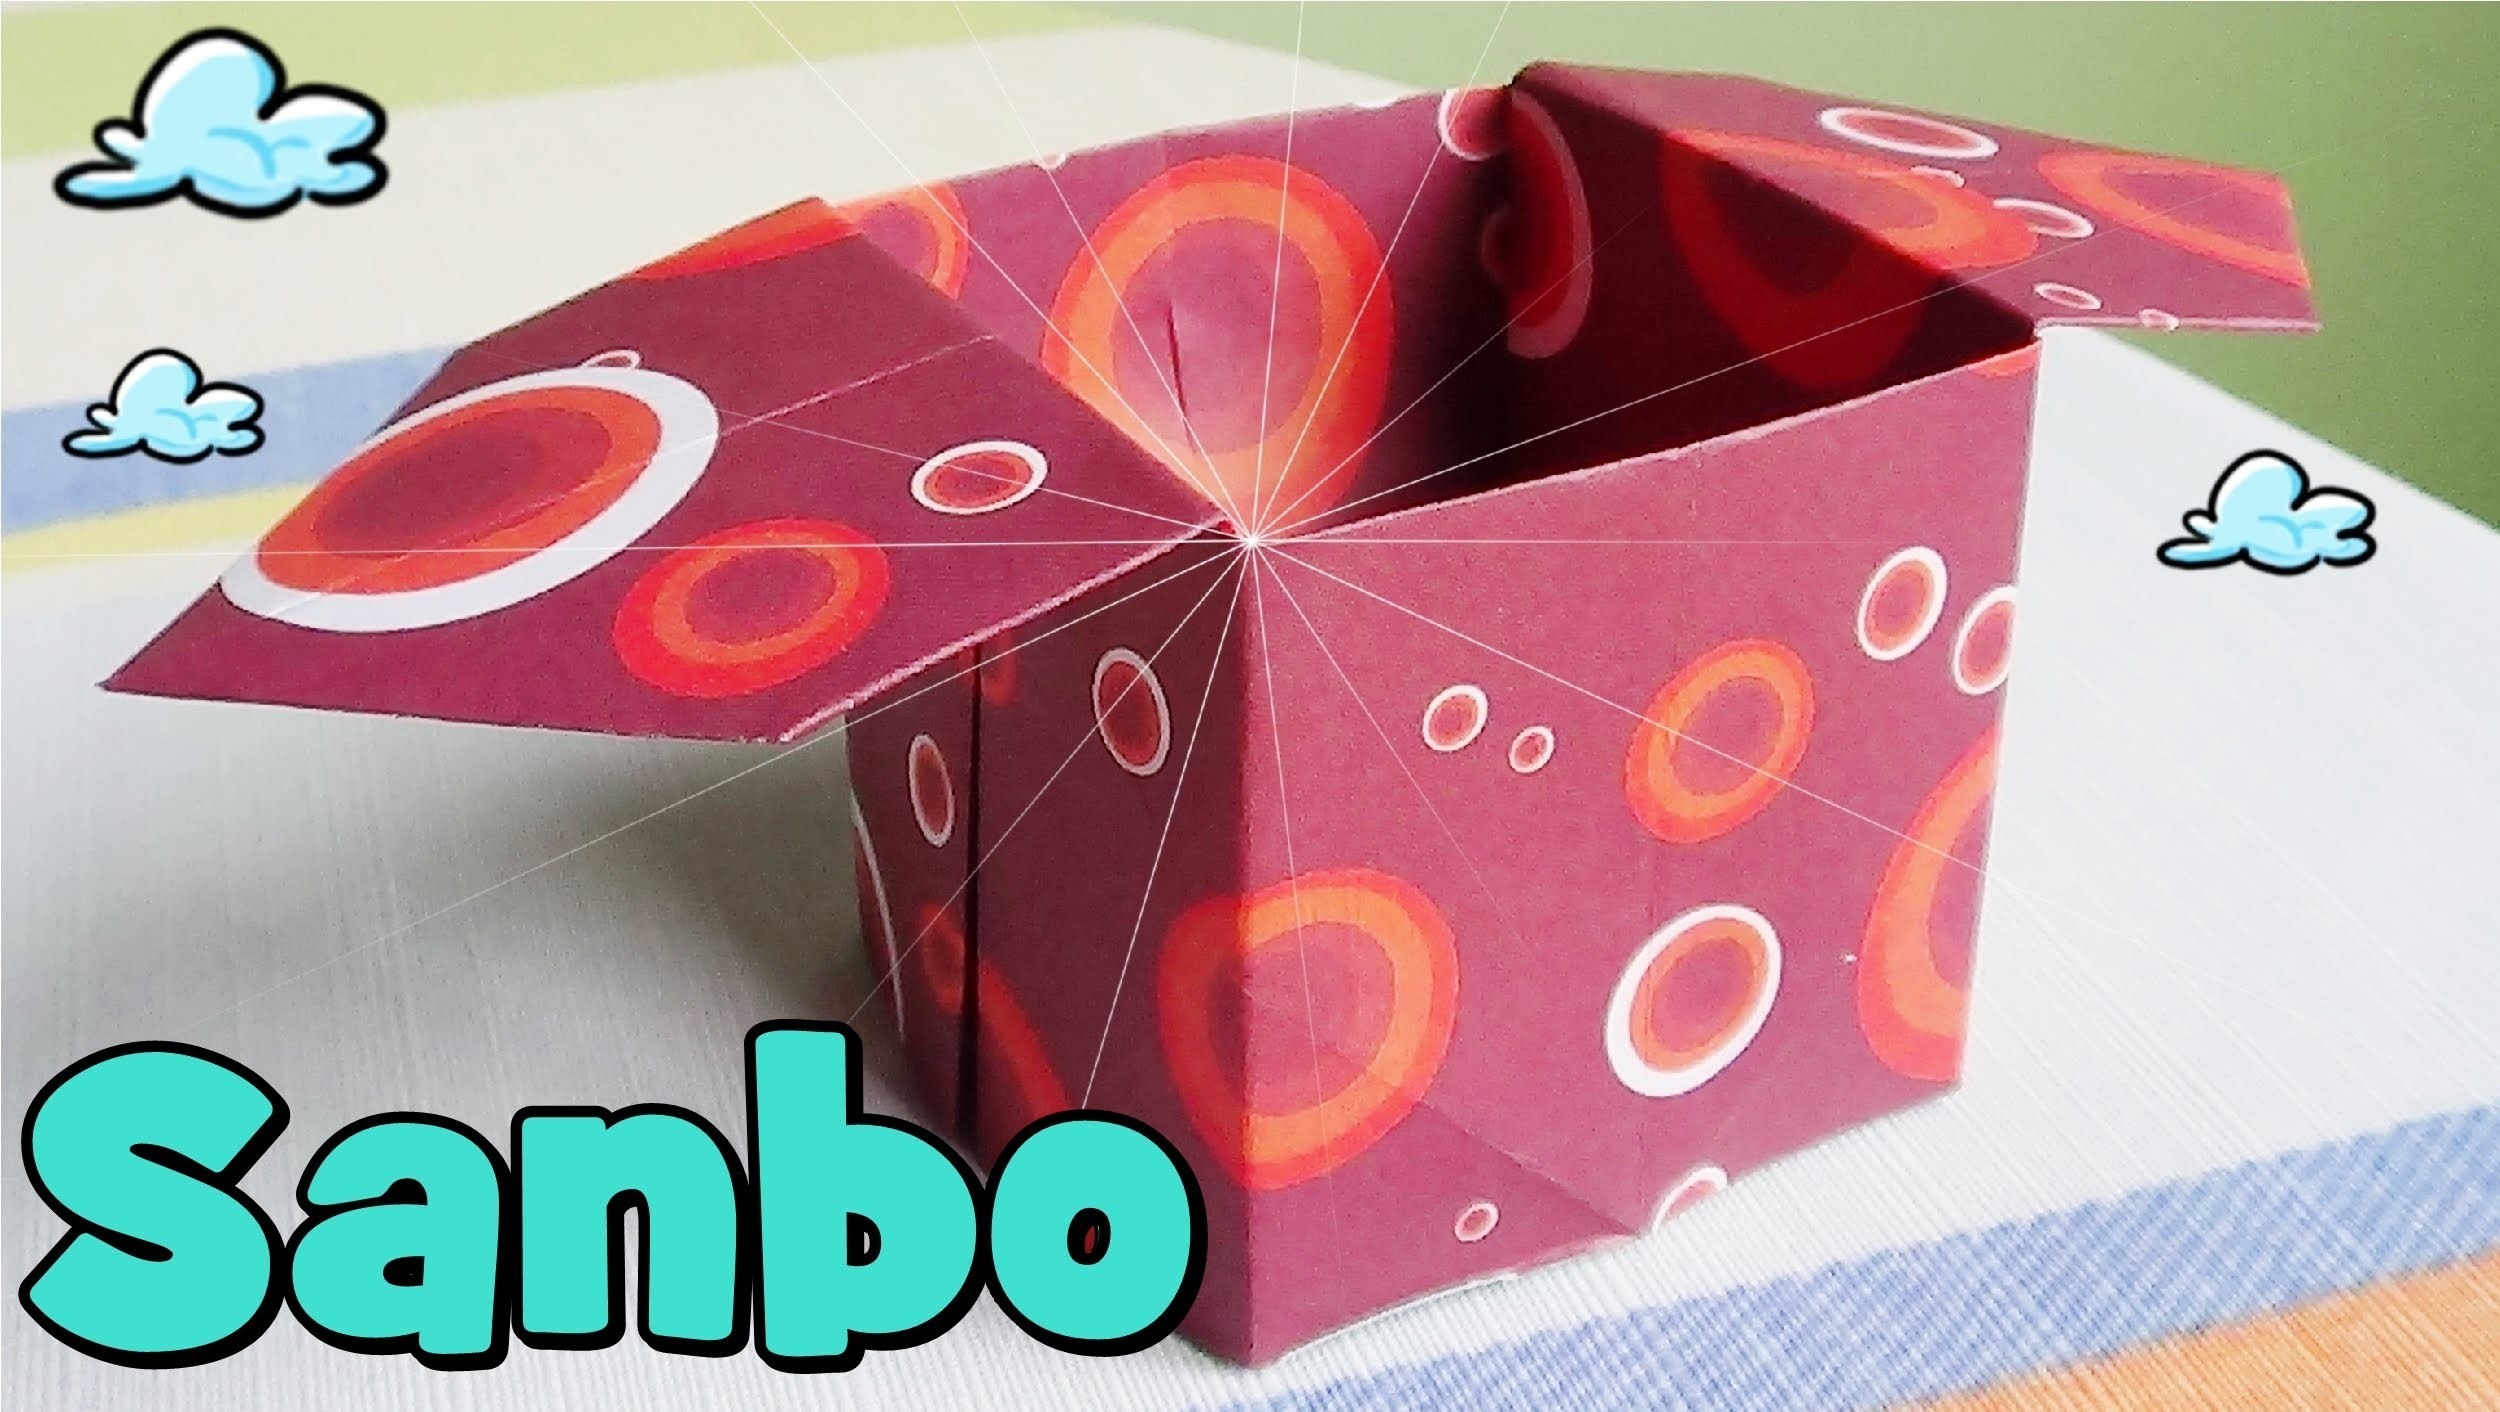 Caja de Papel - Origami Sanbo